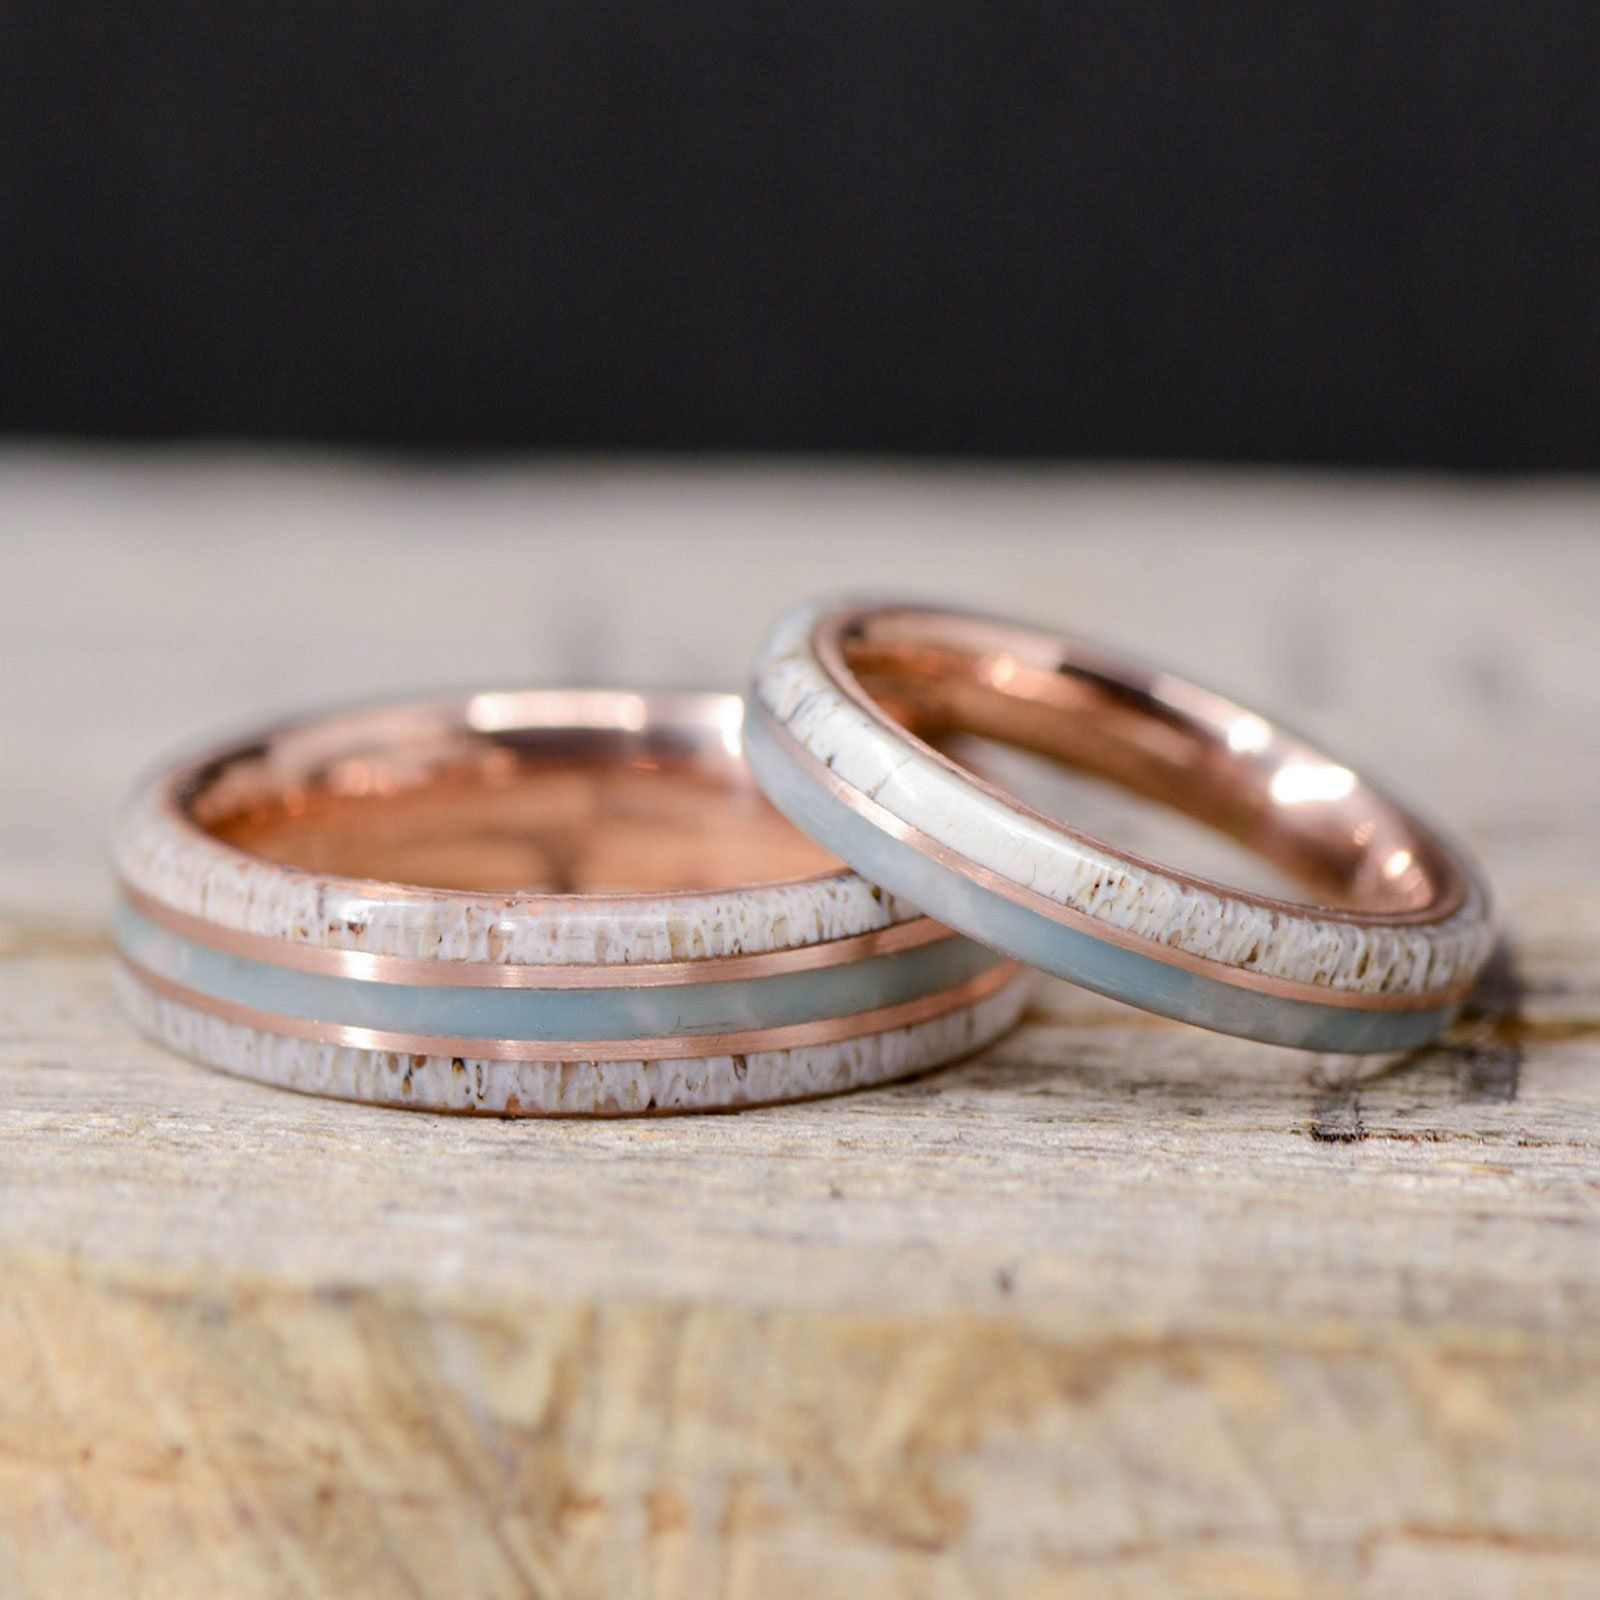 Antler Larimar Rose Gold Pinstripes In 2020 Wedding Ring Sets Sapphire Engagement Ring Blue 14k Rose Gold Engagement Rings